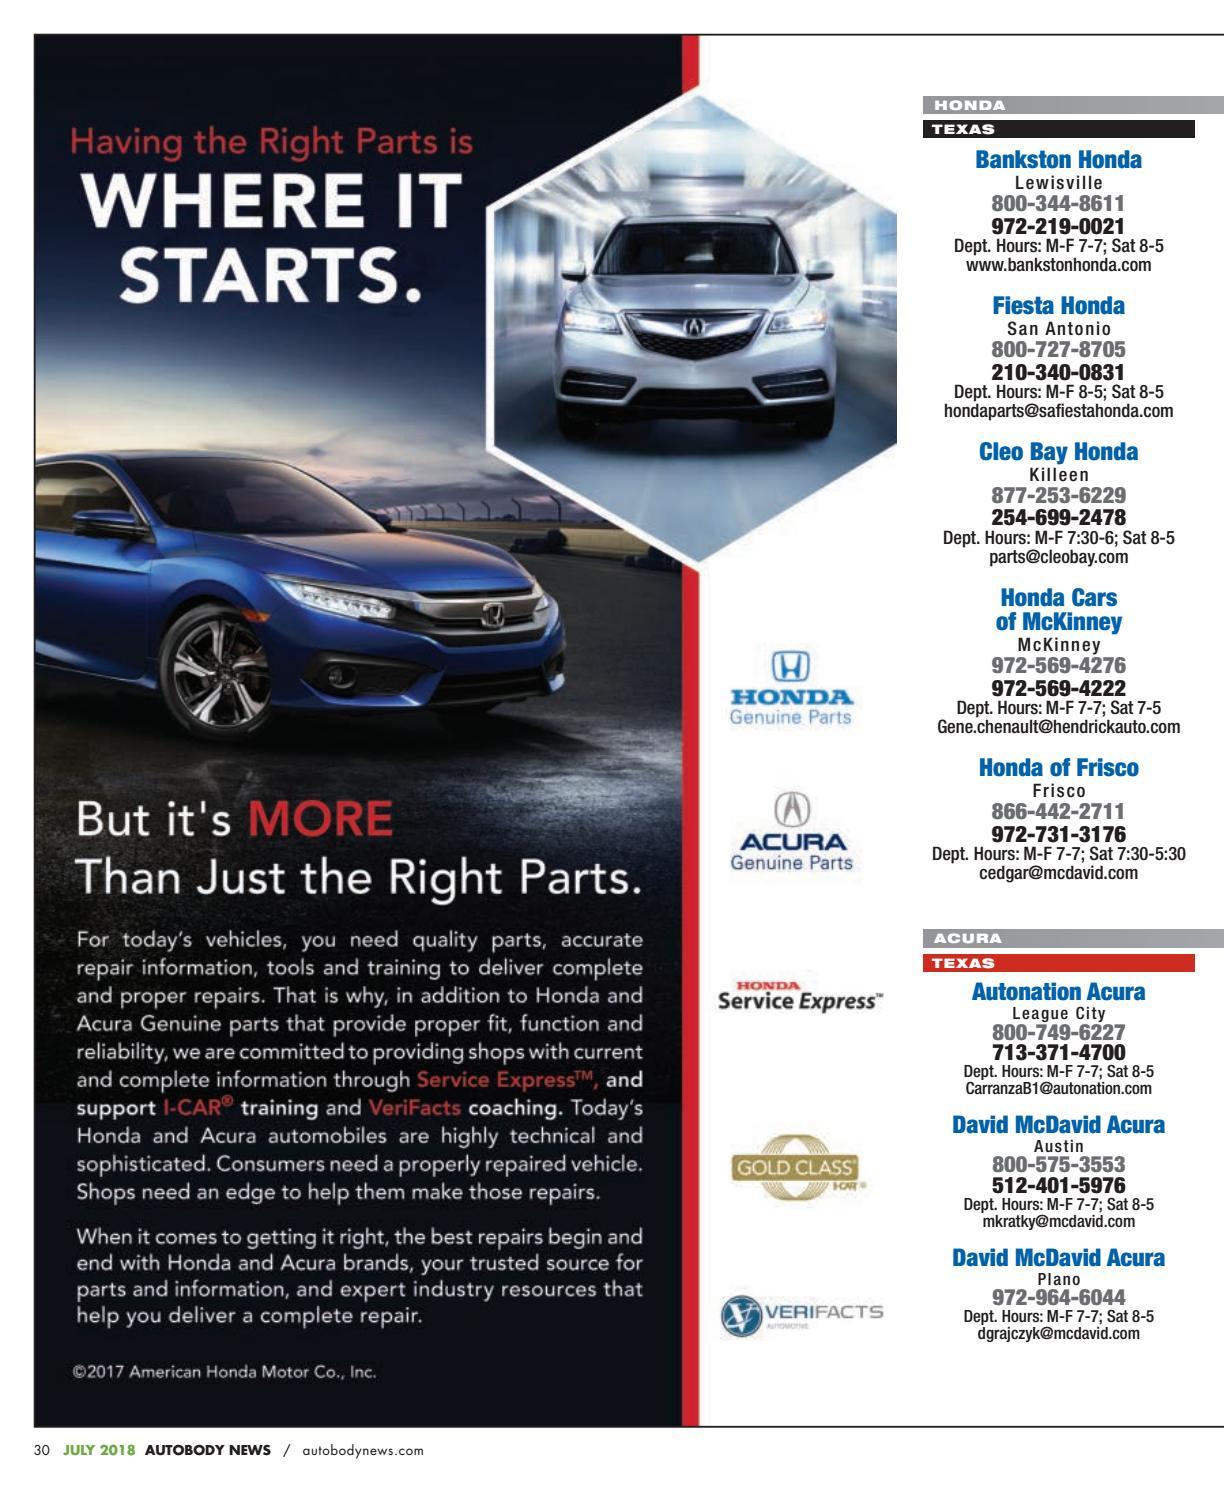 David Mcdavid Acura Austin >> July 2018 Southwest Edition By Autobody News Issuu